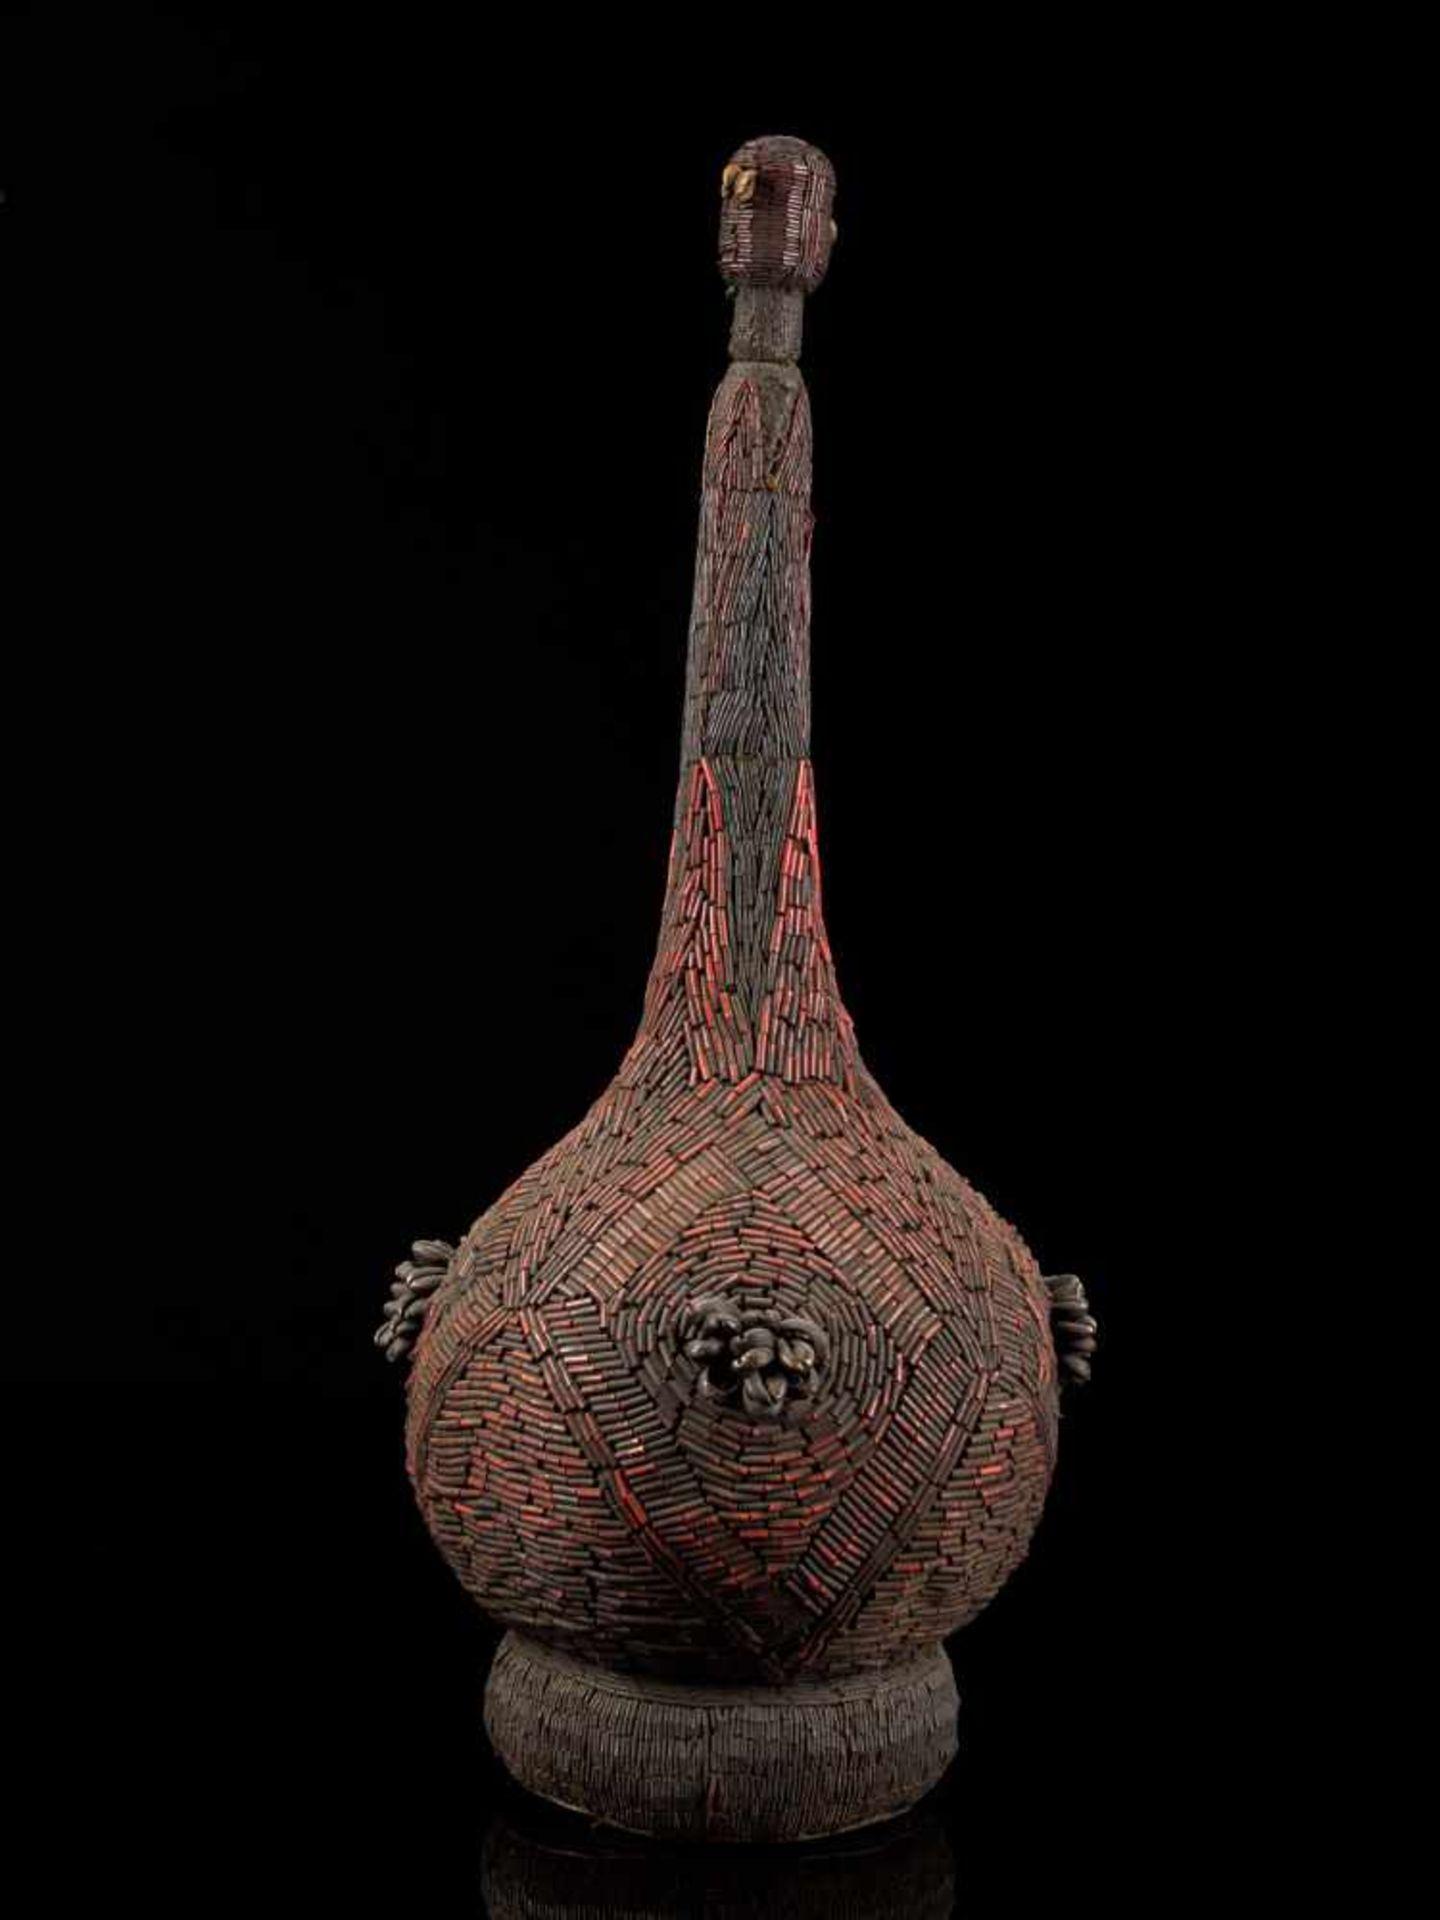 Beaded Palm Wine Vessel Topped With Human Figure - Tribal ArtThis impressive beaded wine vessel is - Bild 4 aus 8